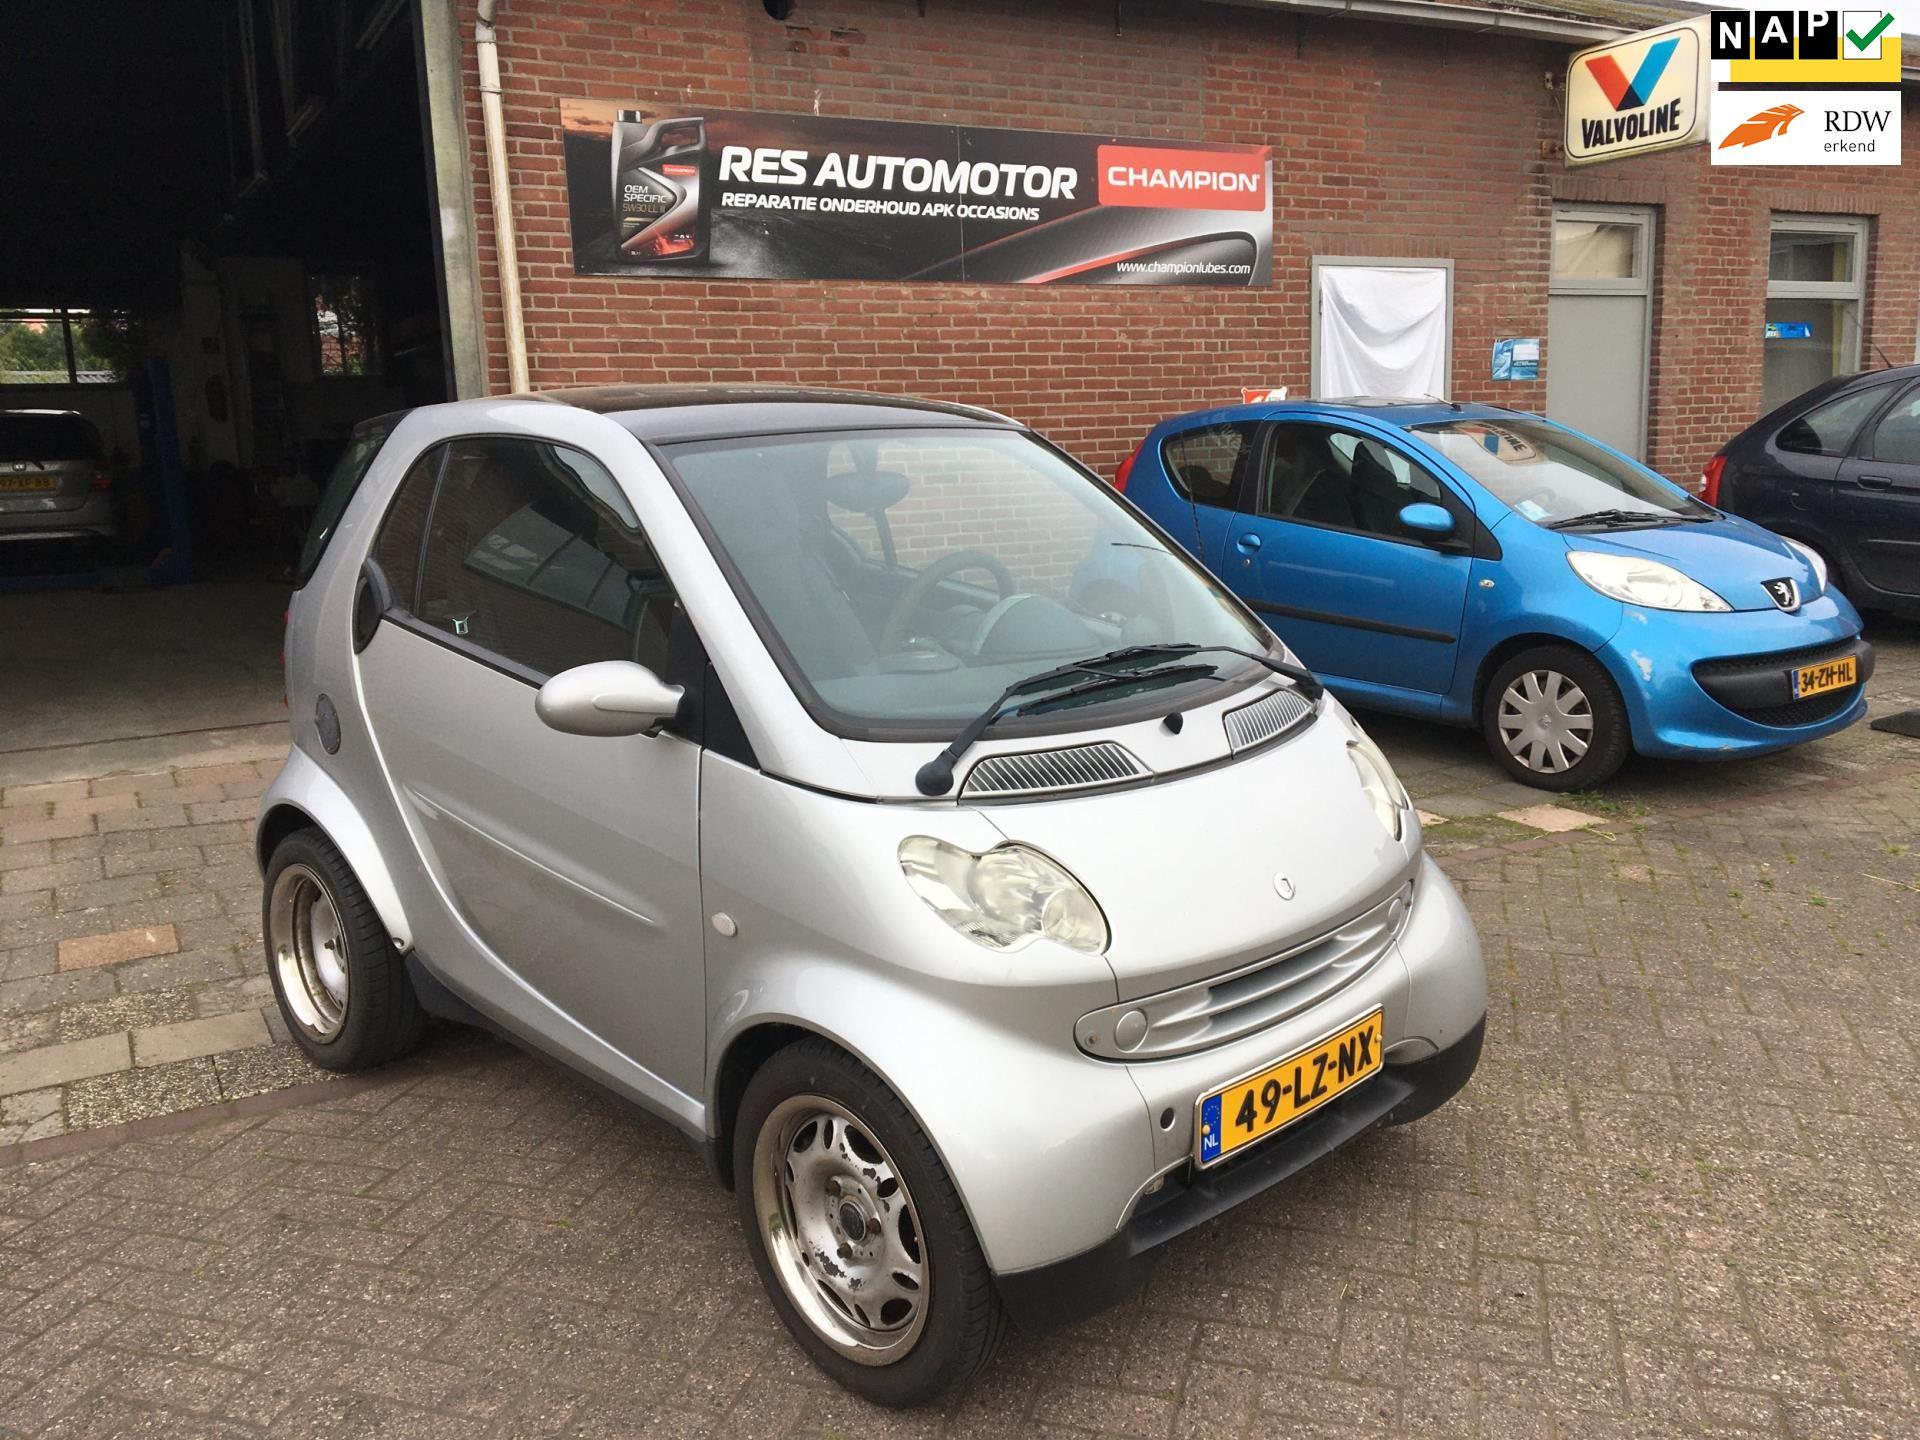 Smart City-coupé occasion - RESAUTOMOTOR